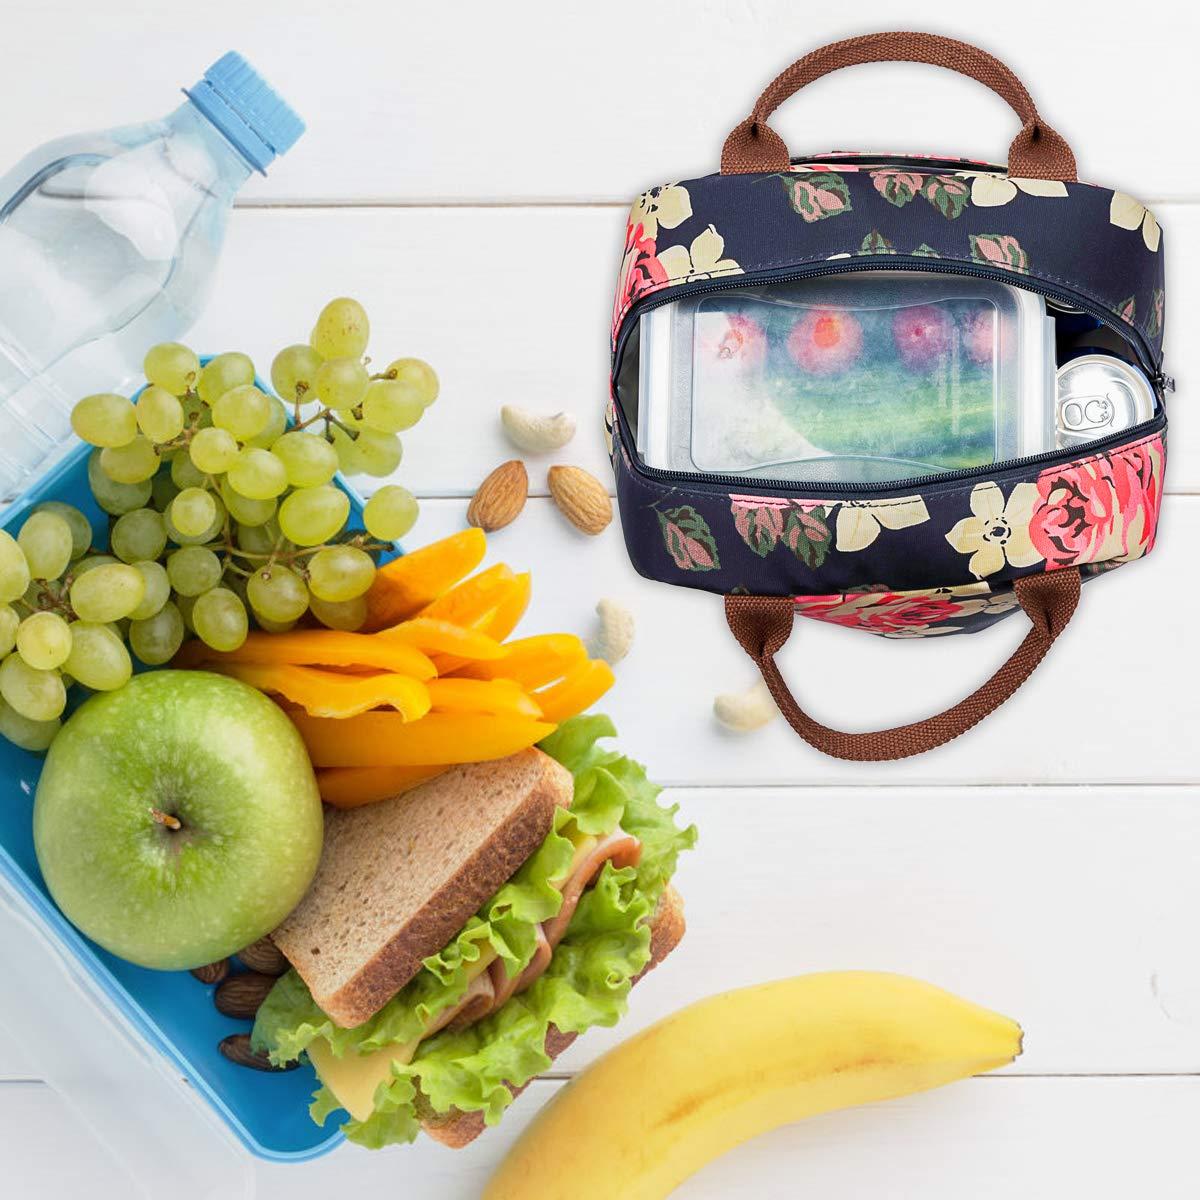 Coolbell Bolsa T/érmica de Almuerzo Bolsa para Picnic Lonchera Bolsa de comida porta con Aislamiento Impermeable Gran Capacidad para Picnic//Escuela//Trabajo//Mujers//Ni/ños//Estudiantes-Gris